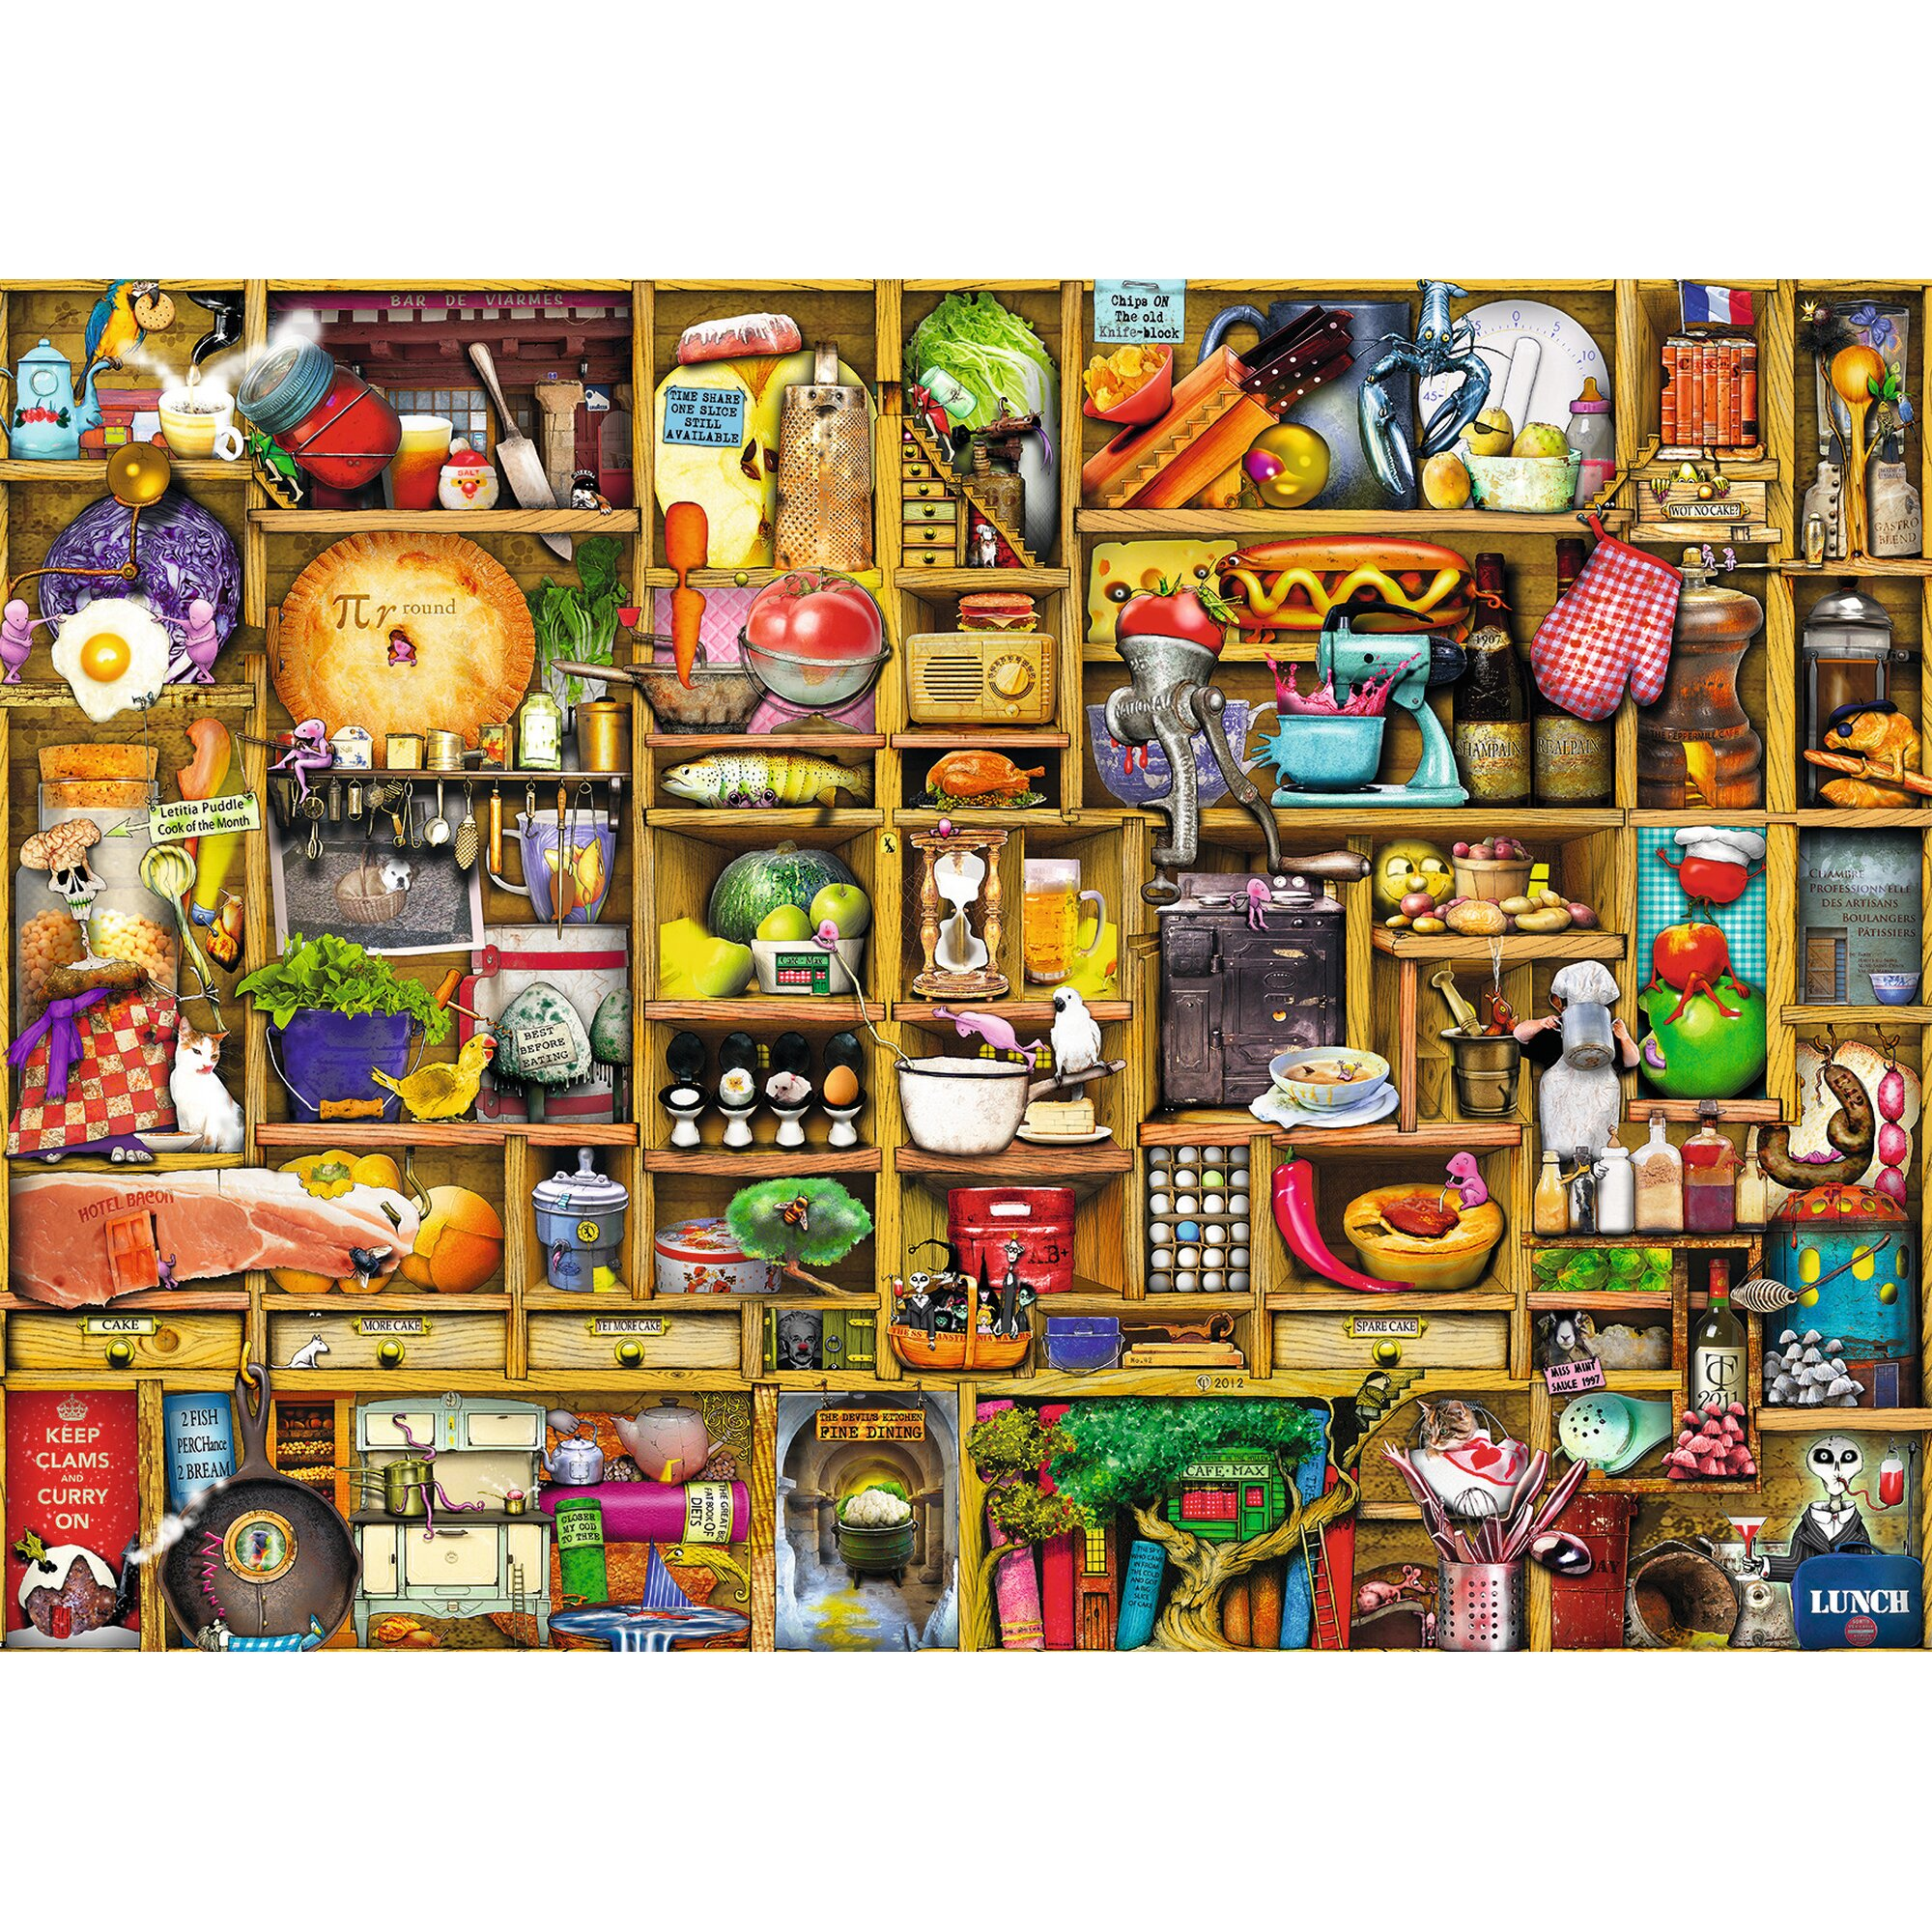 Premiumpuzzle im Standardformat 1.000 Teile, Kurioses Küchenregal